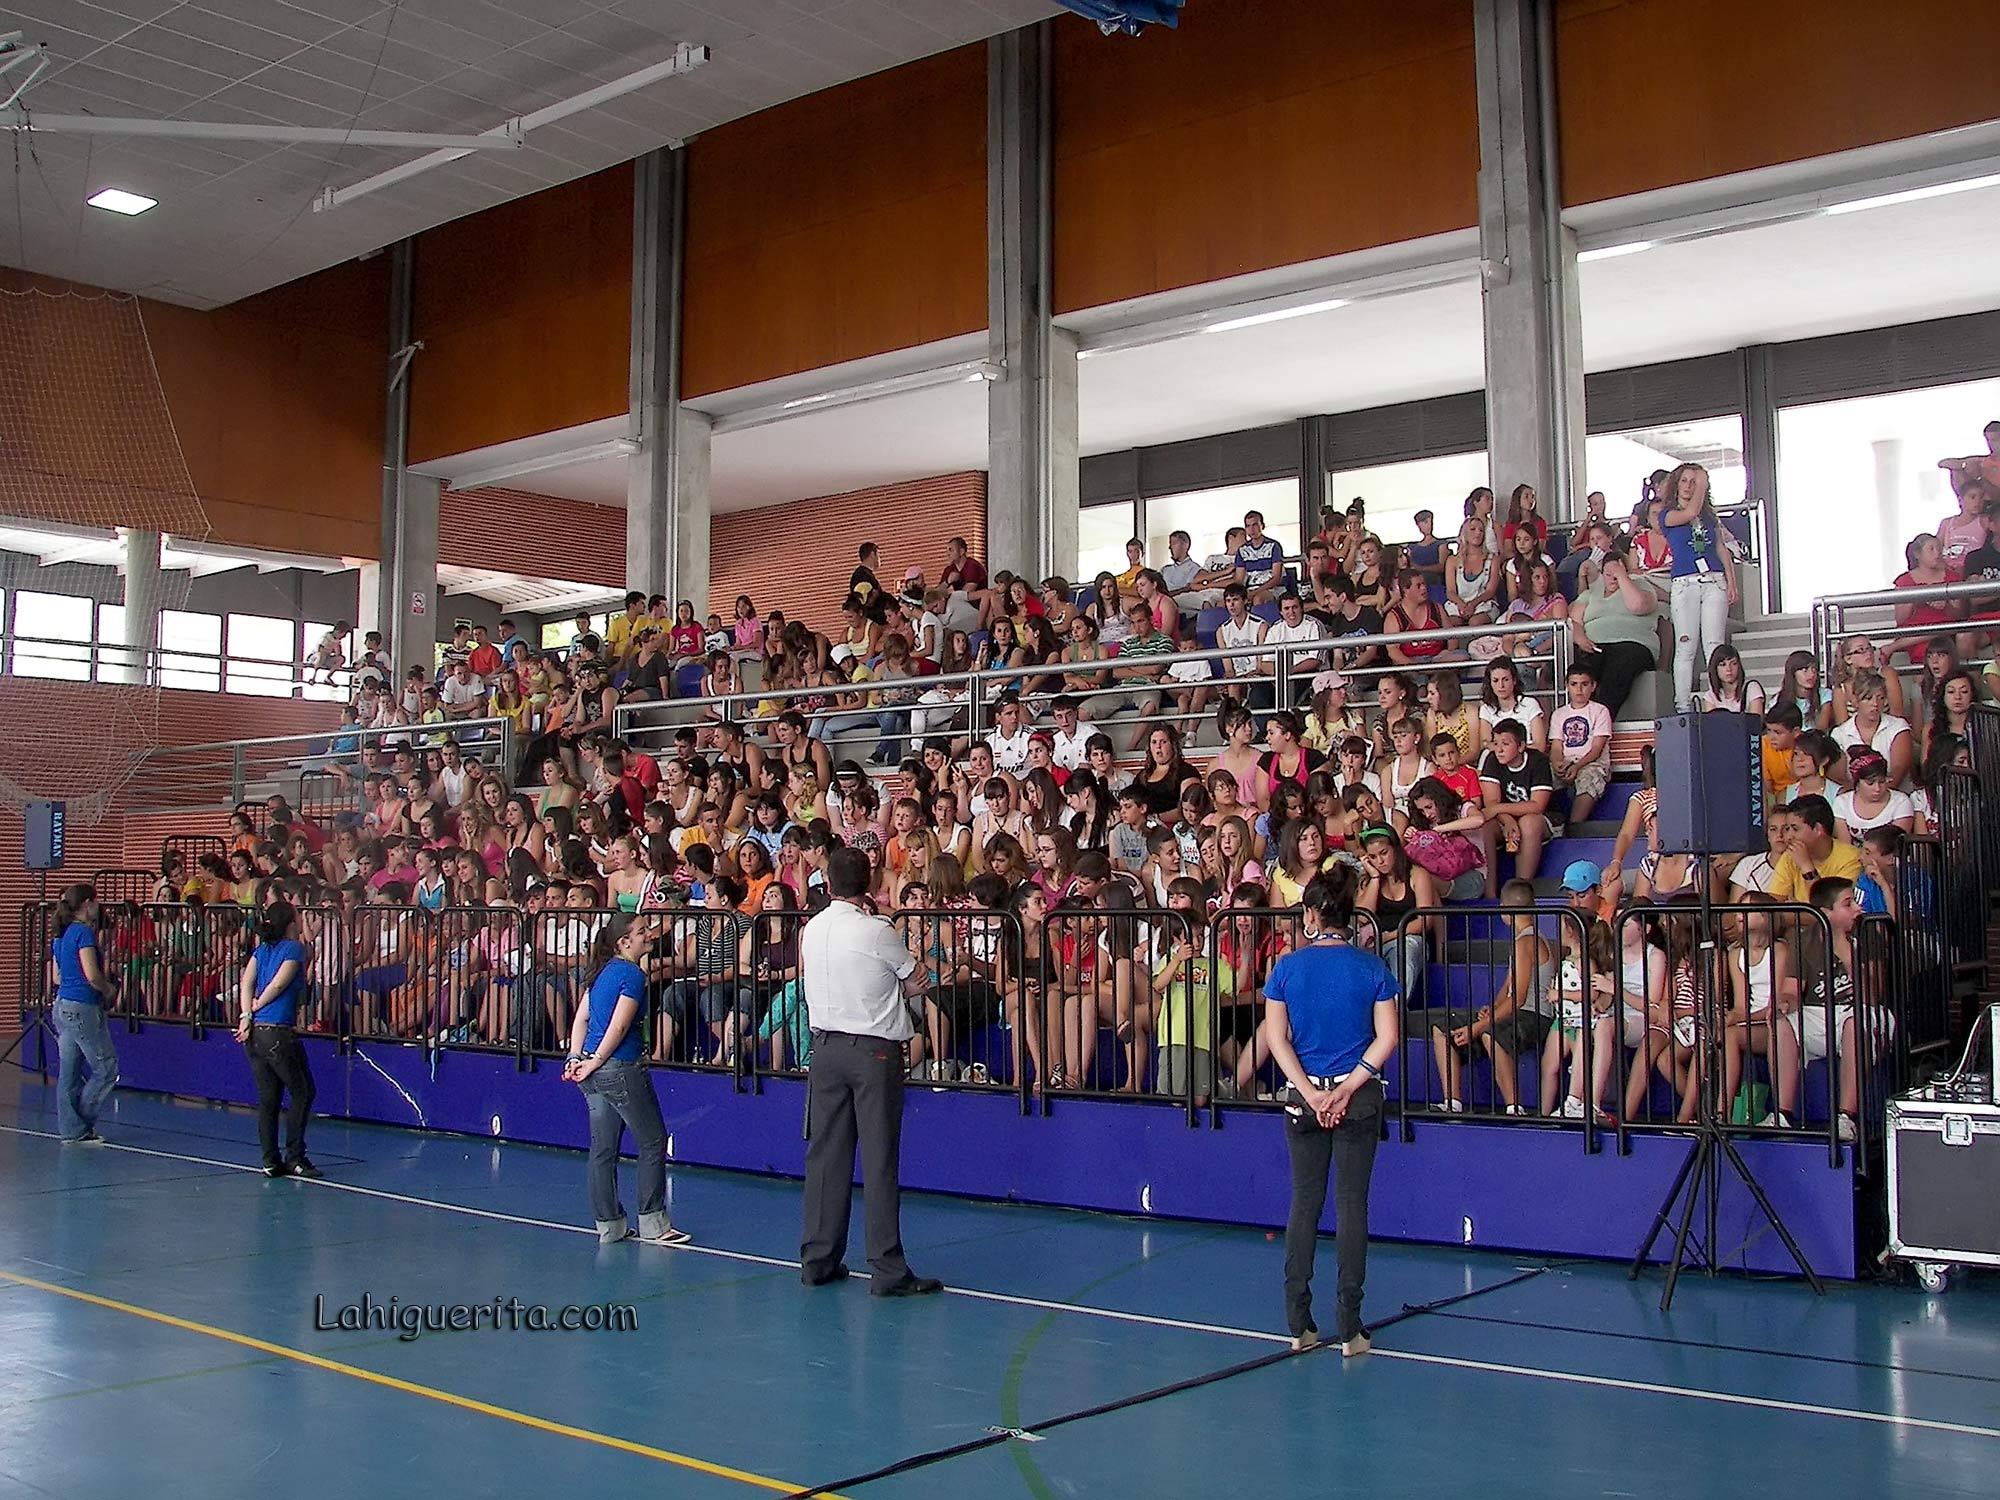 100_3773 fans fisica y quimica – Aguila Roja